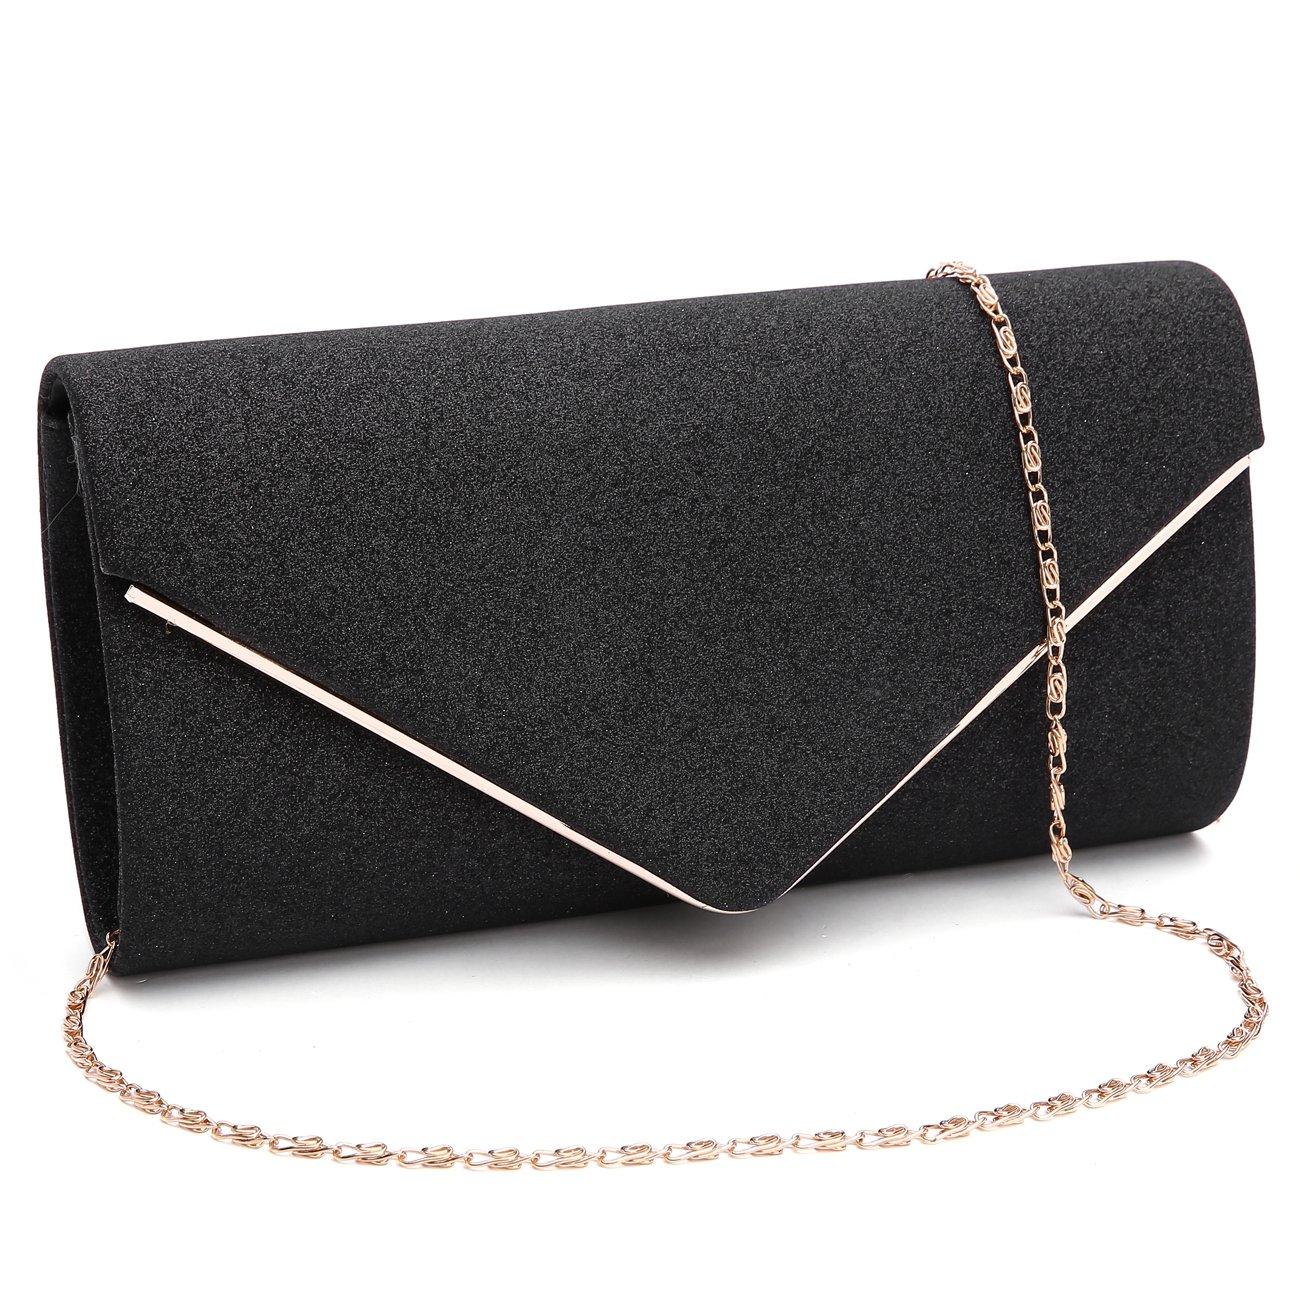 GESU Womens Shining Envelope Clutch Purses Evening Bag Handbags For Wedding and Party.(Black) by GESU